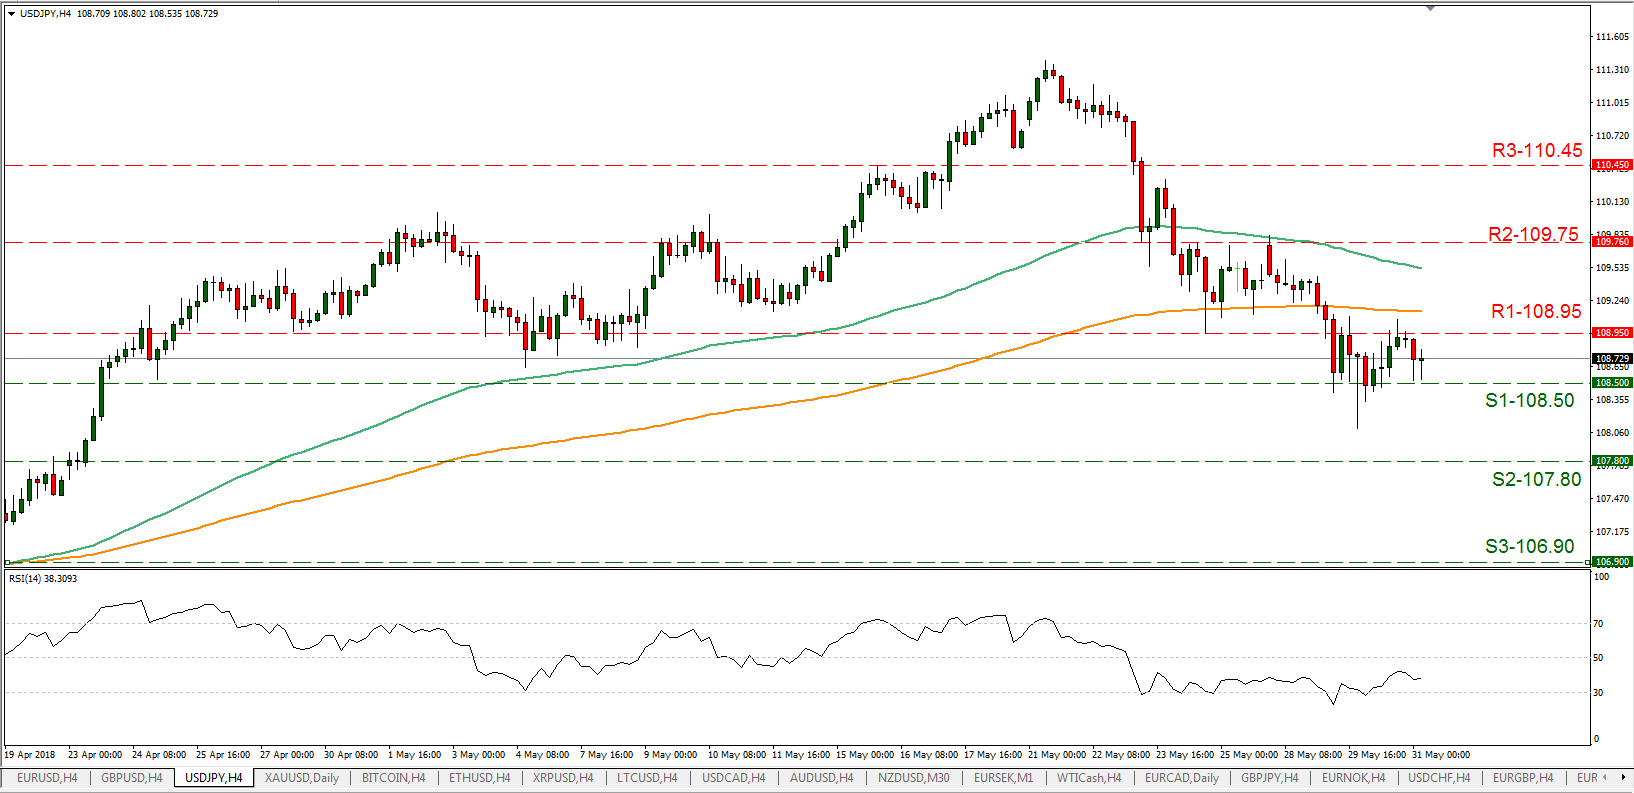 USD/JPY 31/05/2018 | EconAlerts